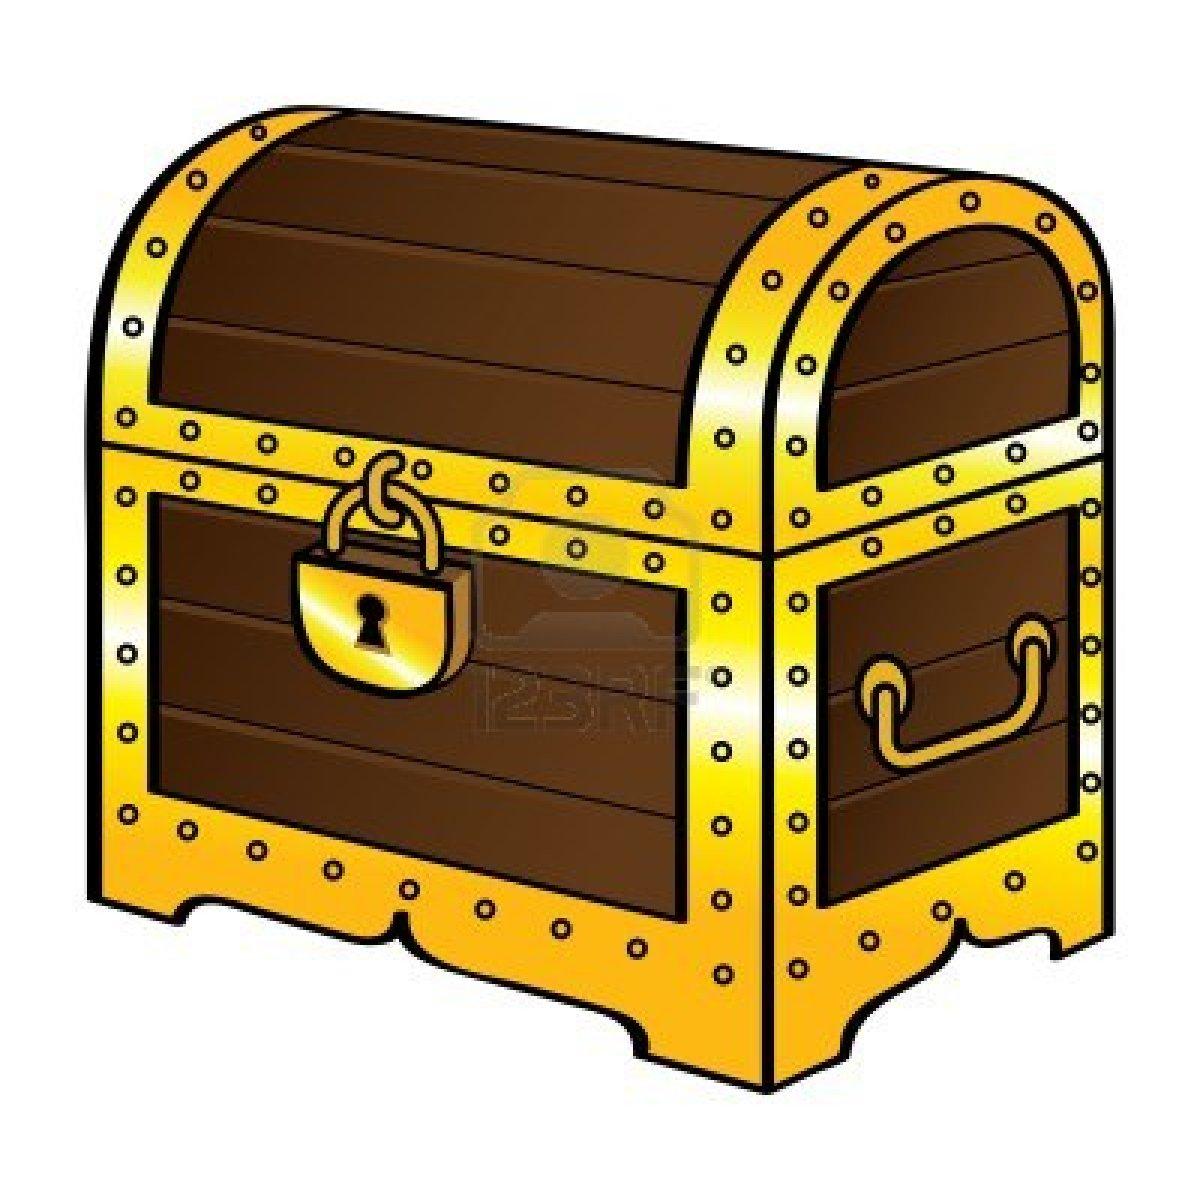 Treasure chest clip art vector .-Treasure chest clip art vector .-7